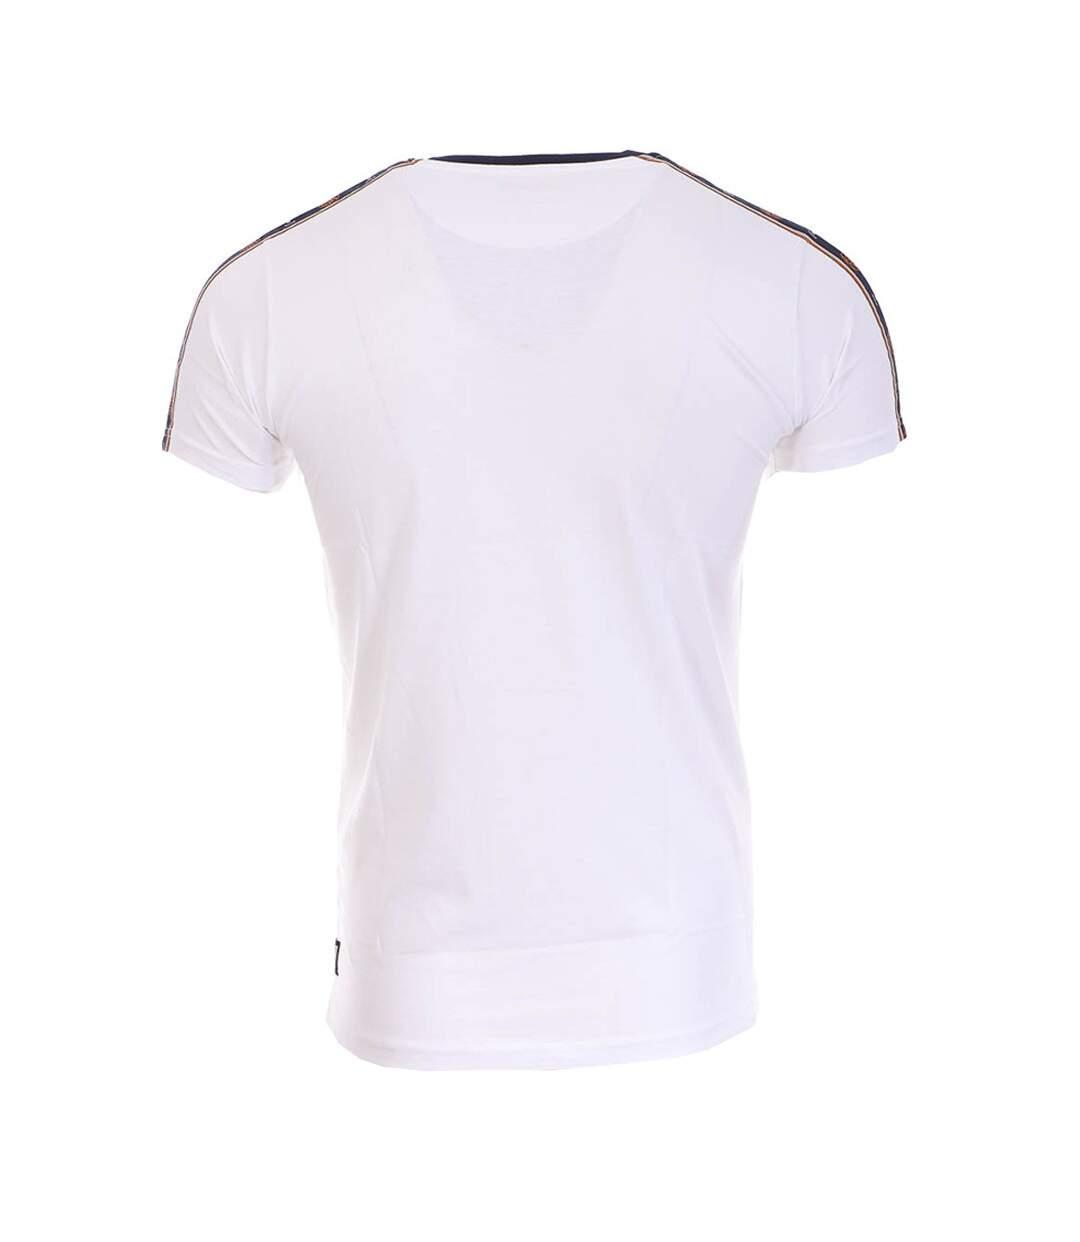 T-Shirt Blanc homme Capslab DRAGON BALL Z Goku